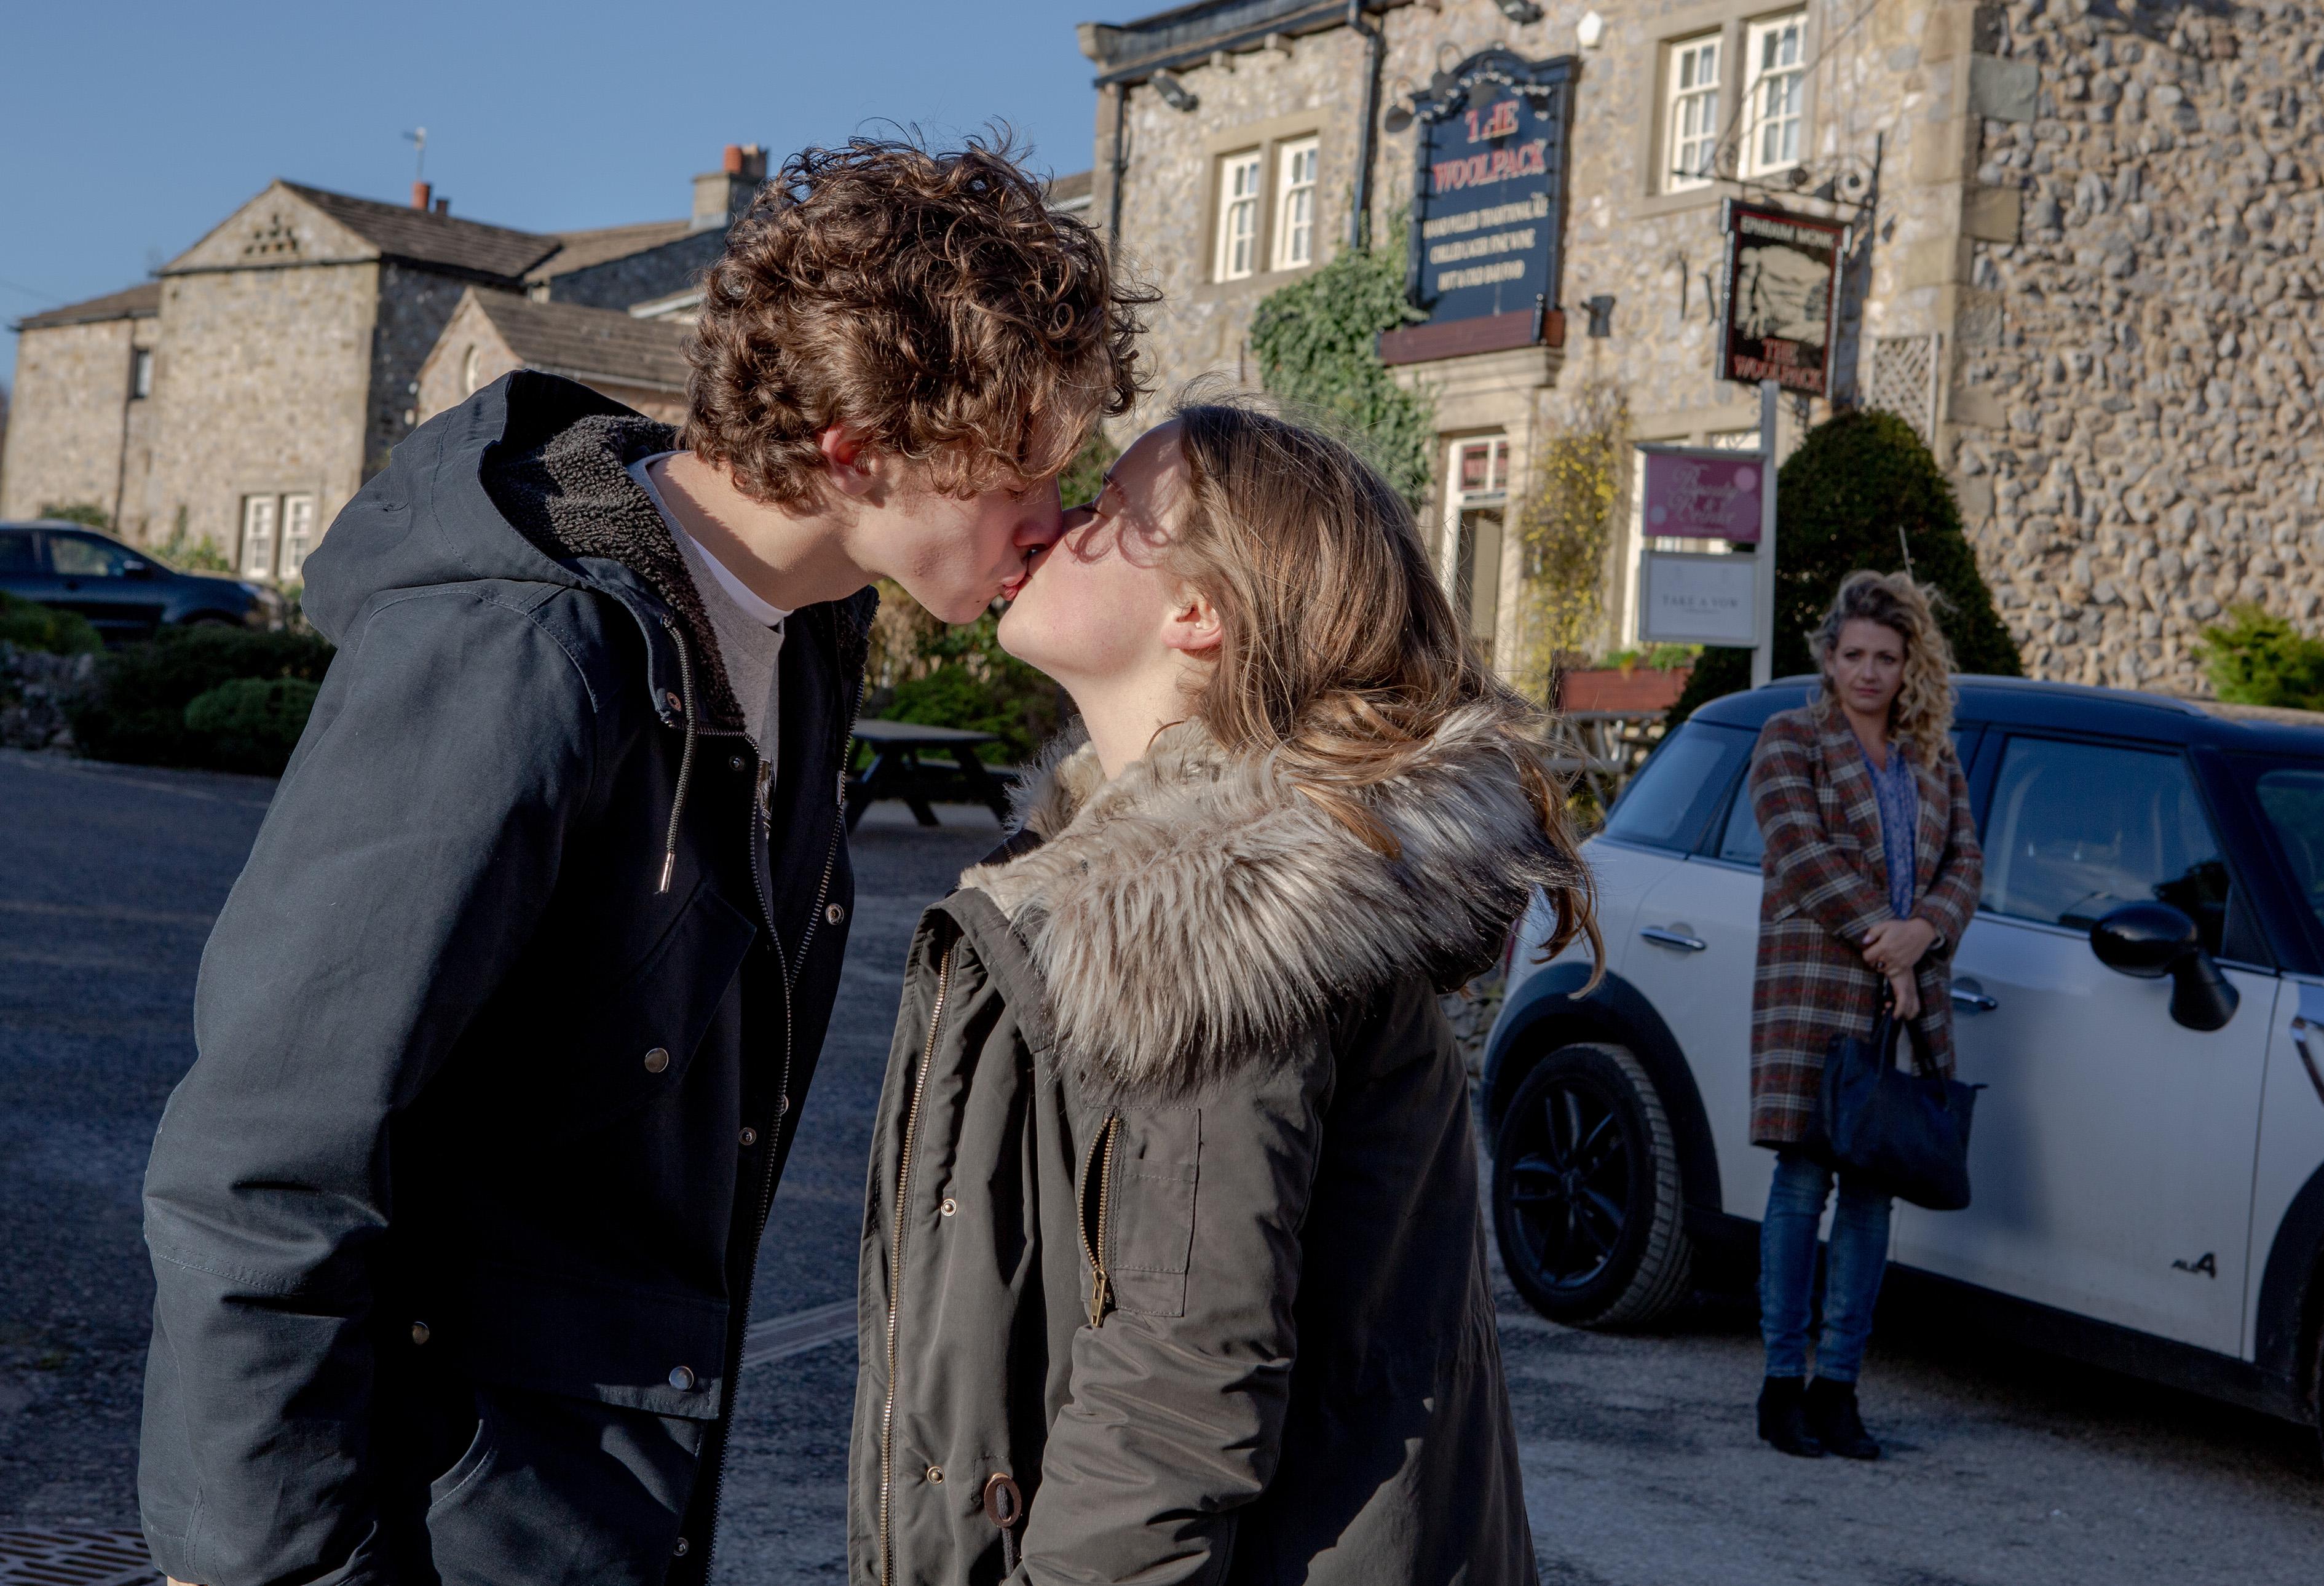 Emmerdale spoilers: Maya Stepney turns on Liv Flaherty over Jacob Gallagher kiss?